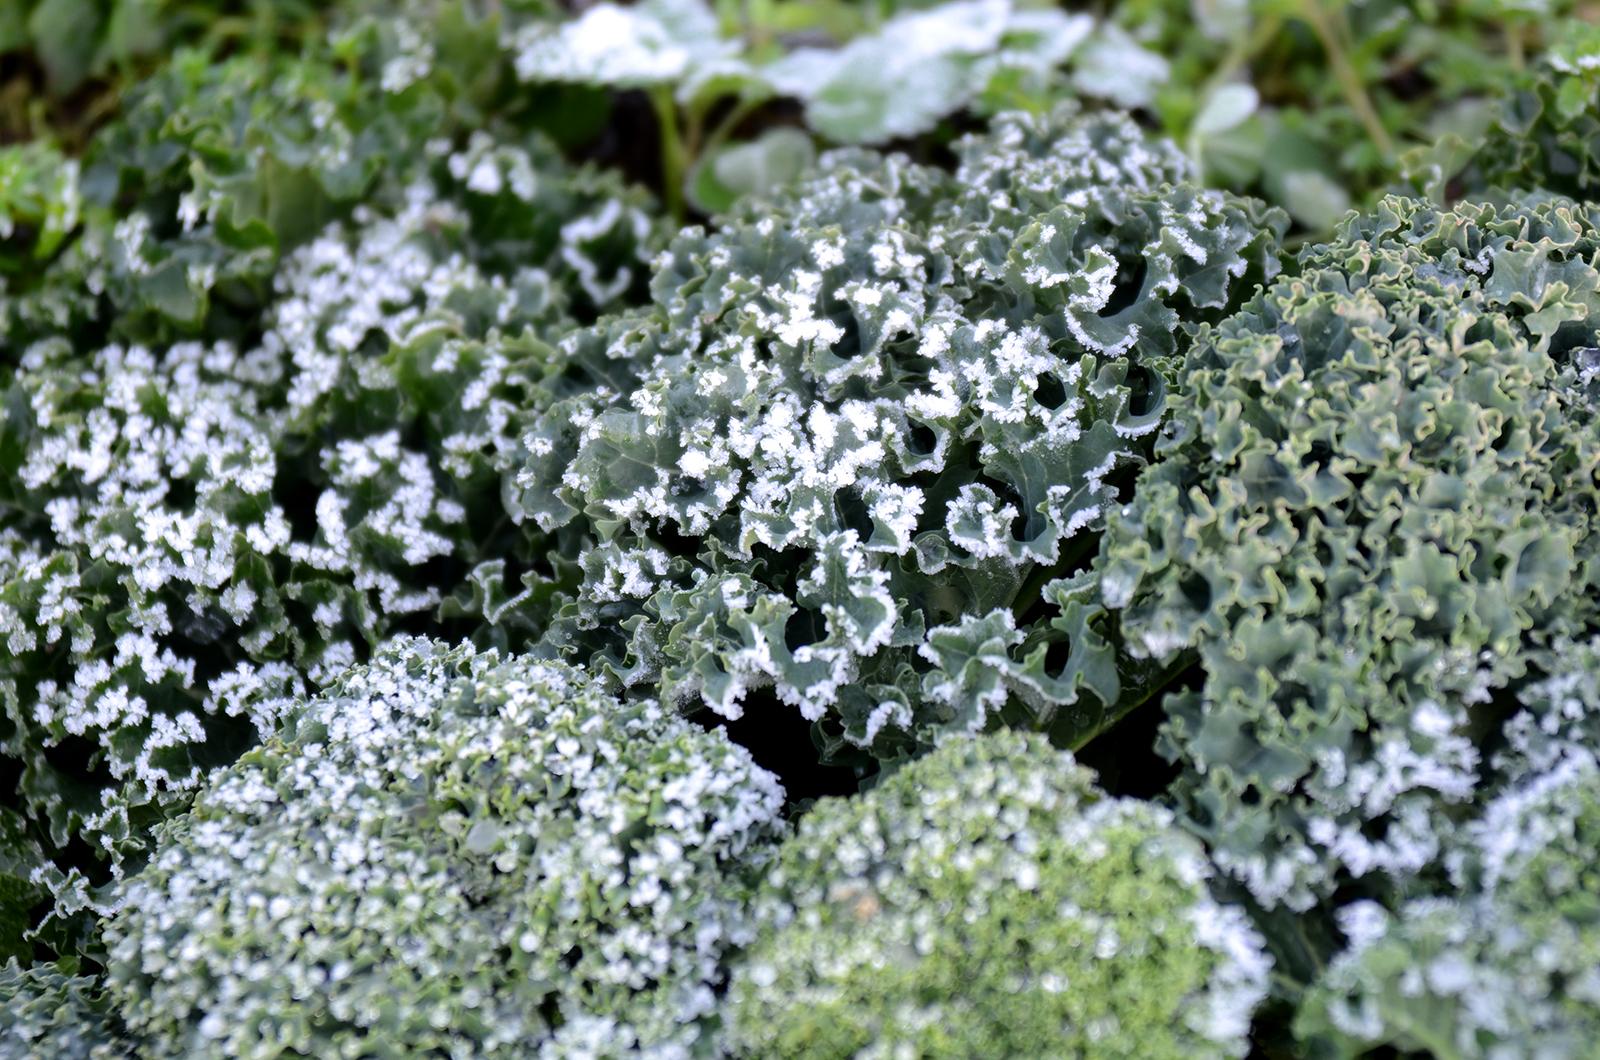 Kale after a deep frost: December 2013